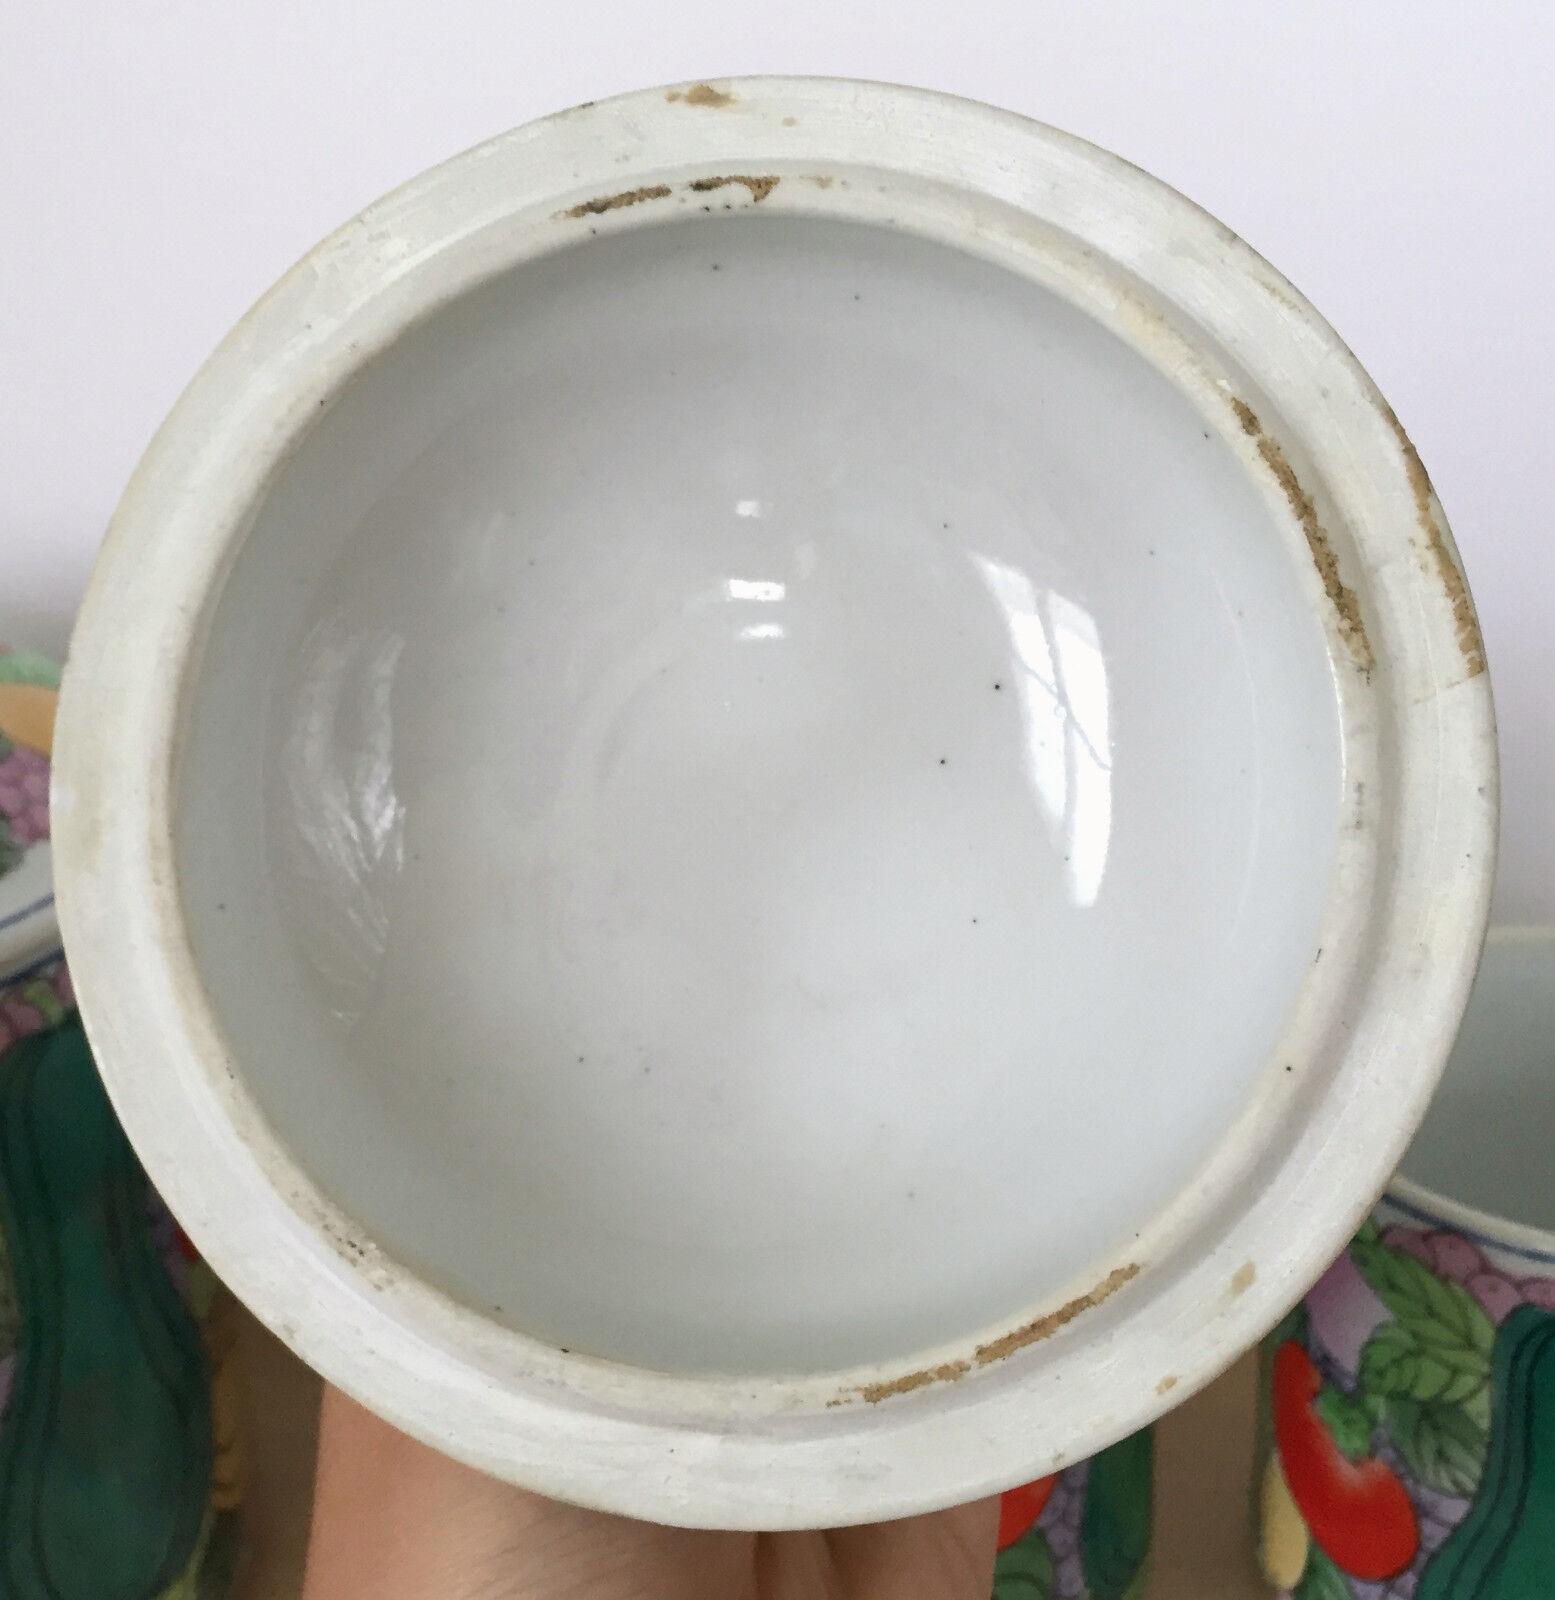 Williams Sonoma Vegetable Fruit Garden Design Stoneware Stoneware Stoneware Canister 3 Jar Set 5c502e